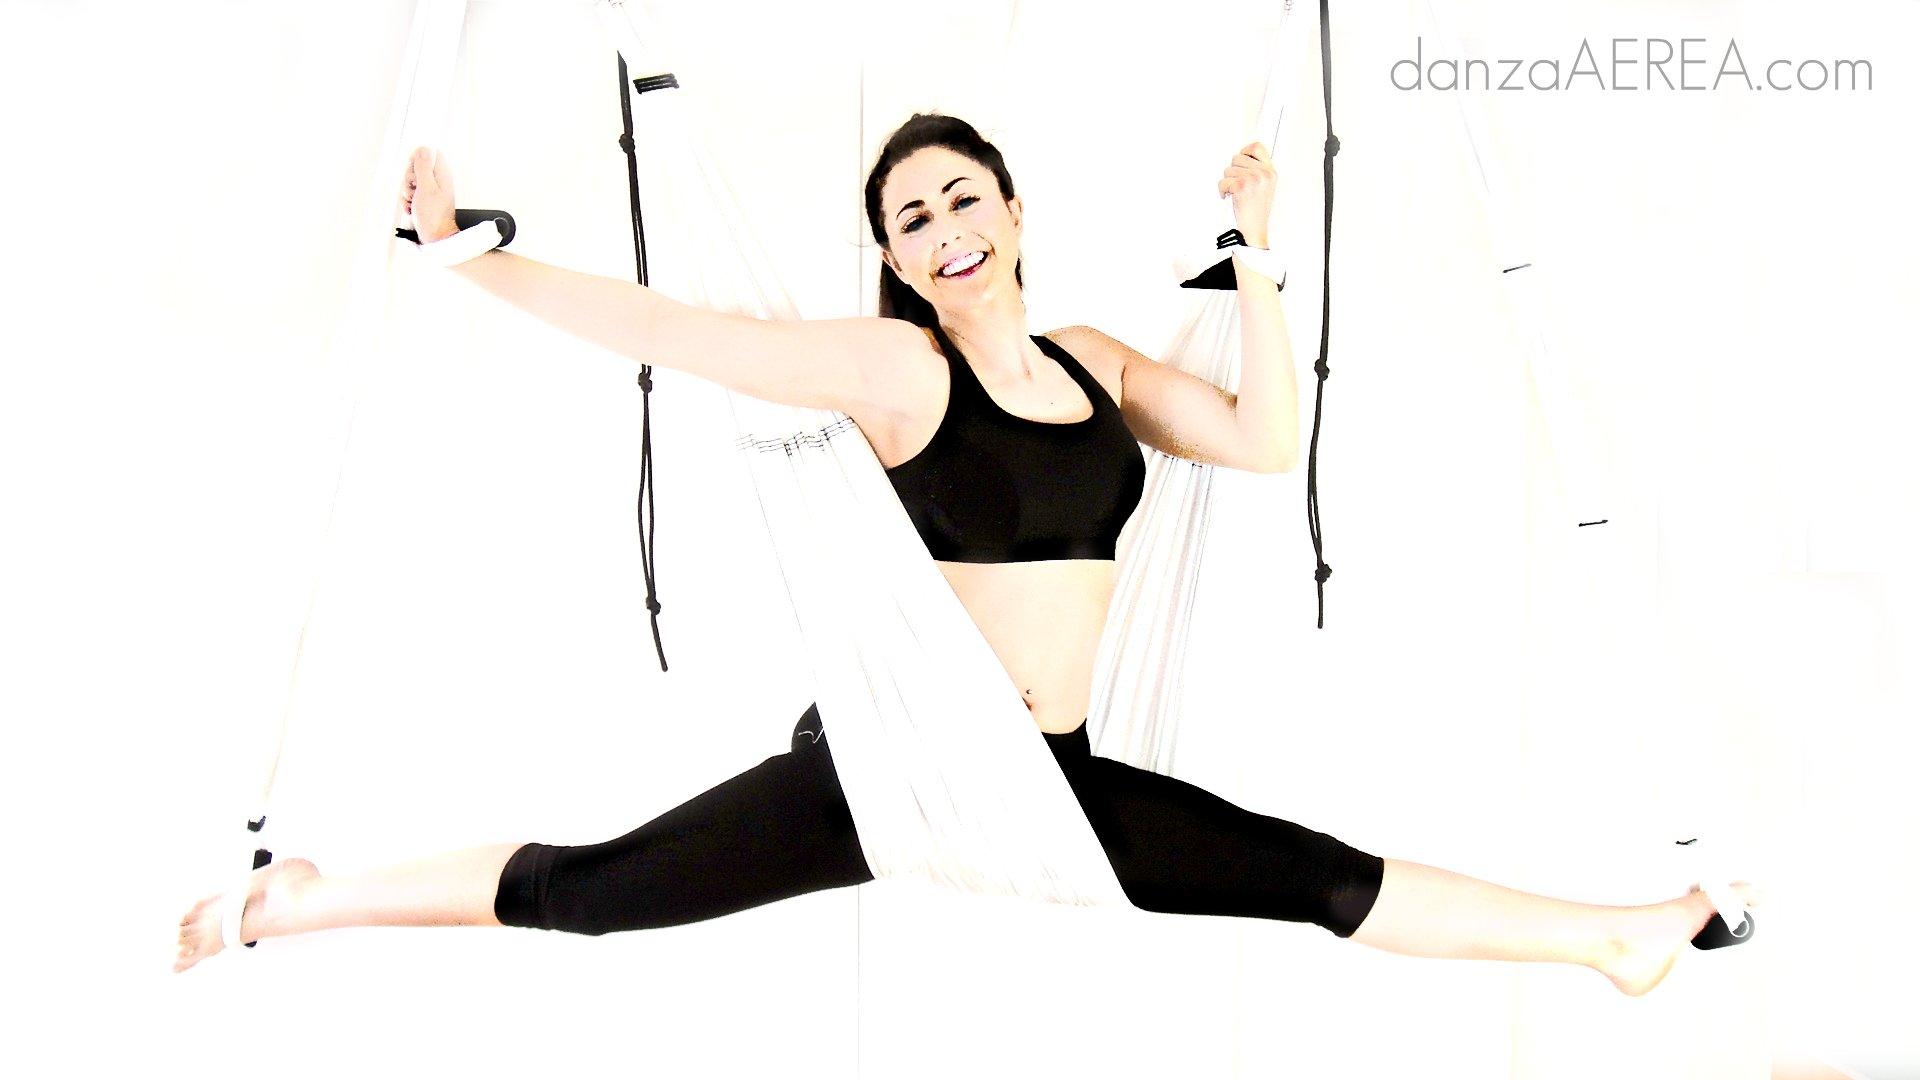 DANZA AEREA (AERIAL DANCE) BY AERO YOGA©